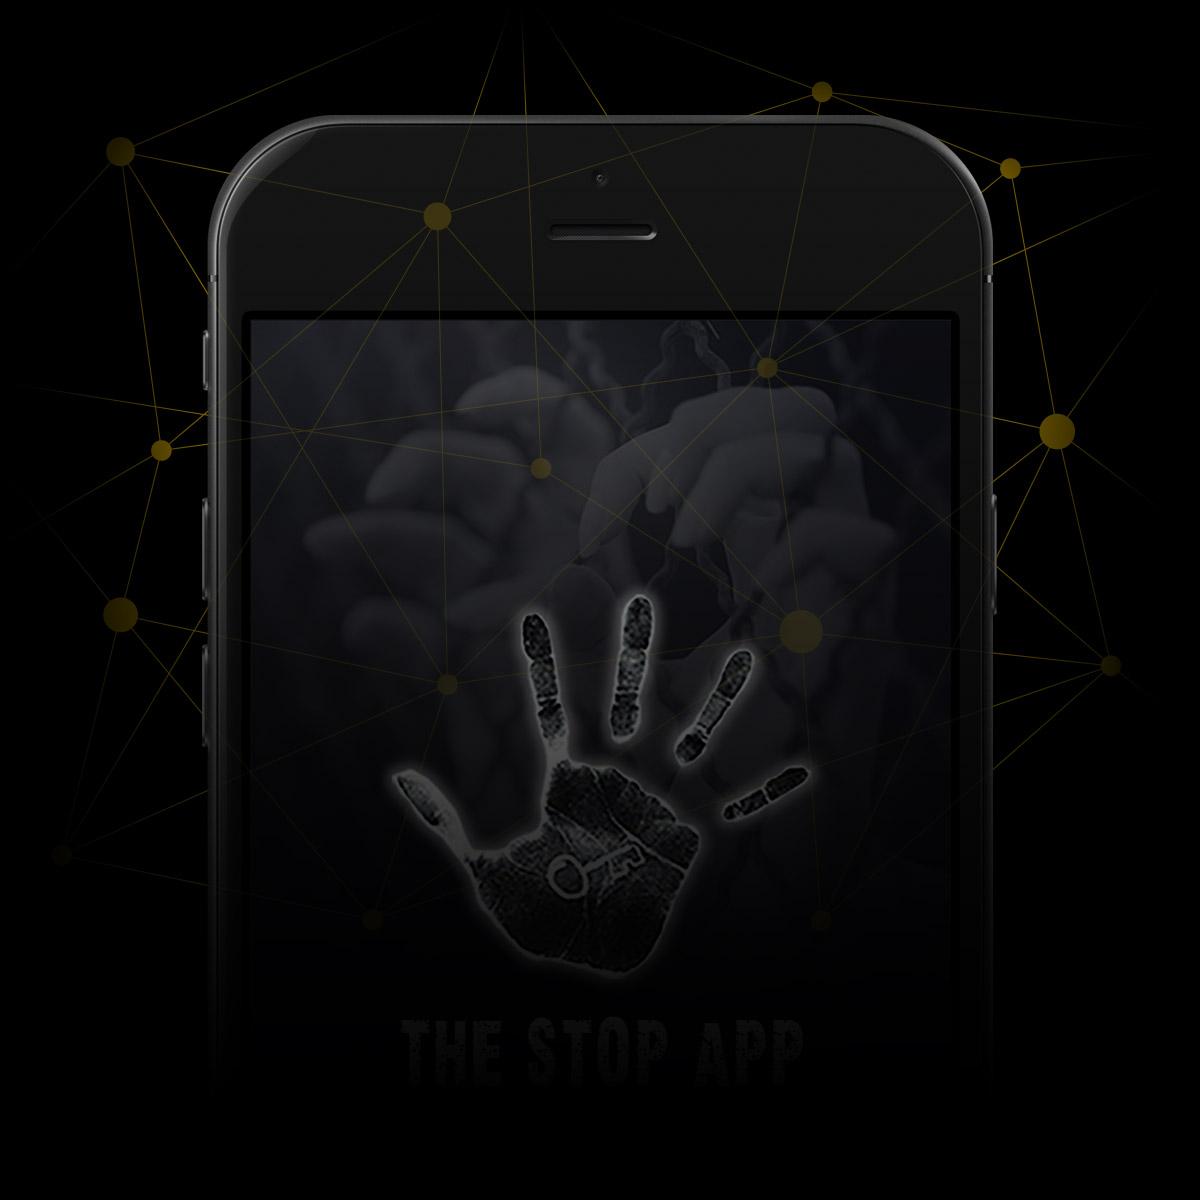 stop-app-bg-webbed_1200x1200